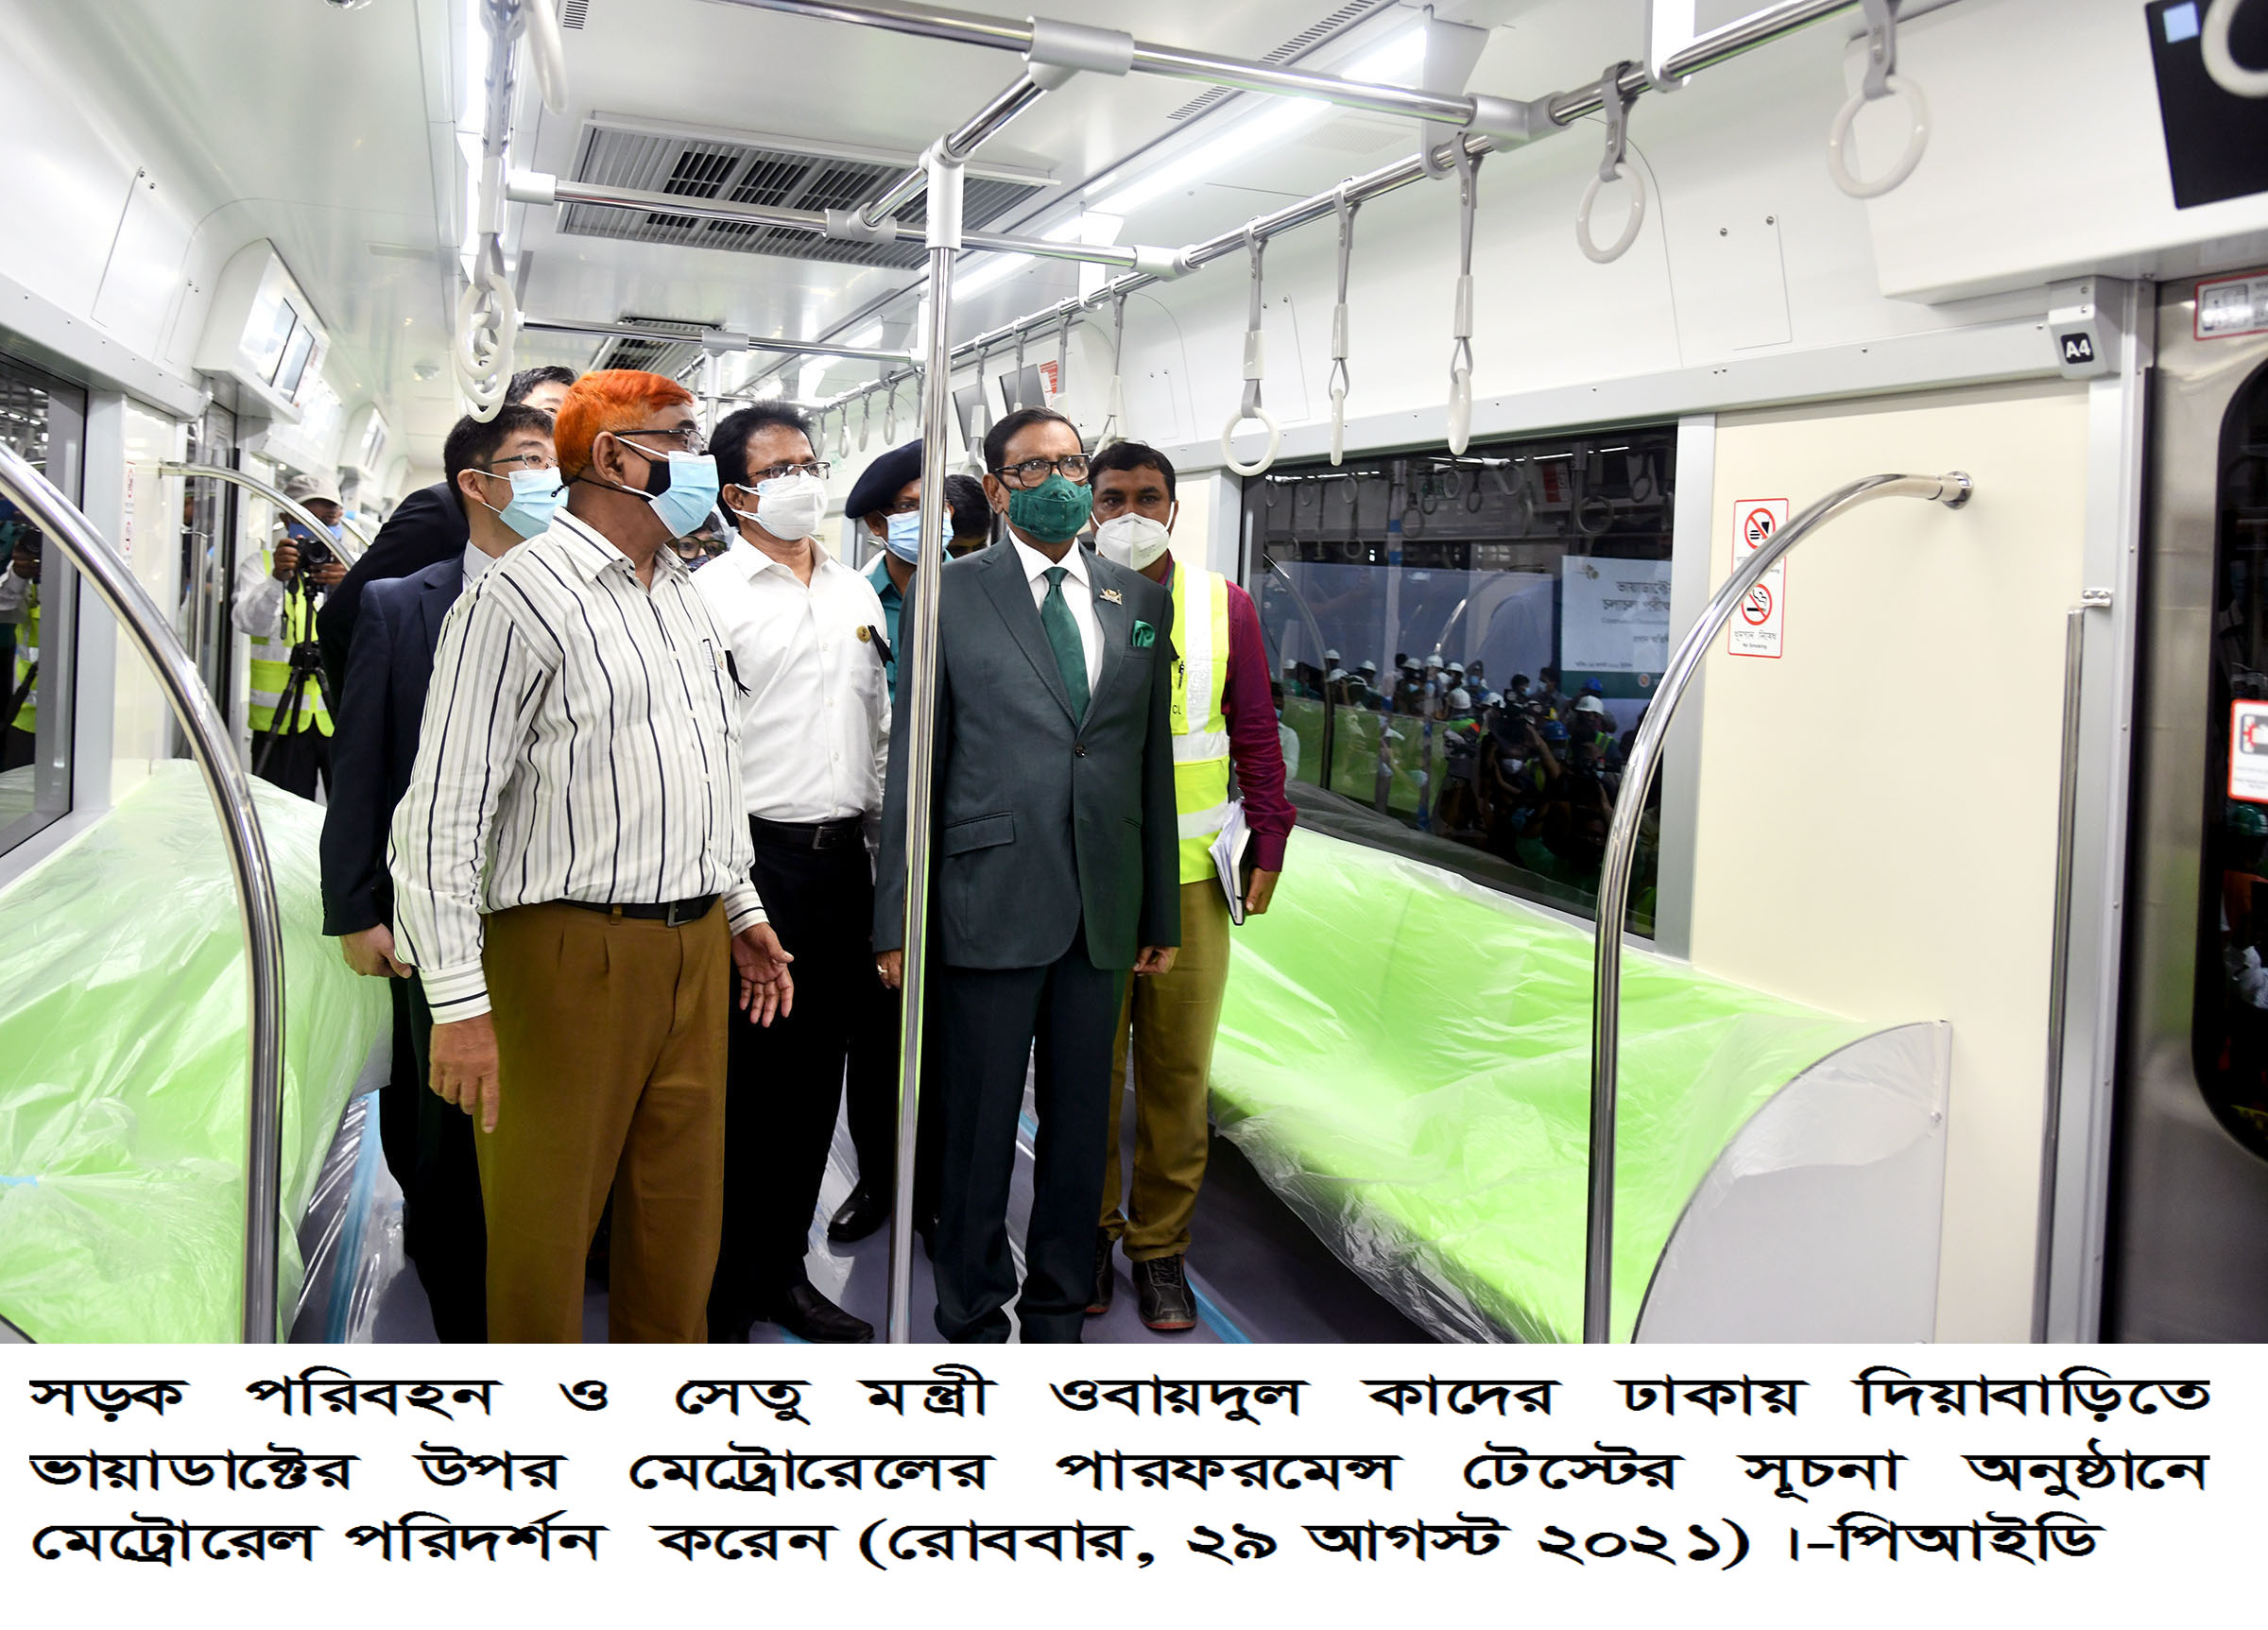 Dhaka Metro undergoes crucial trial run